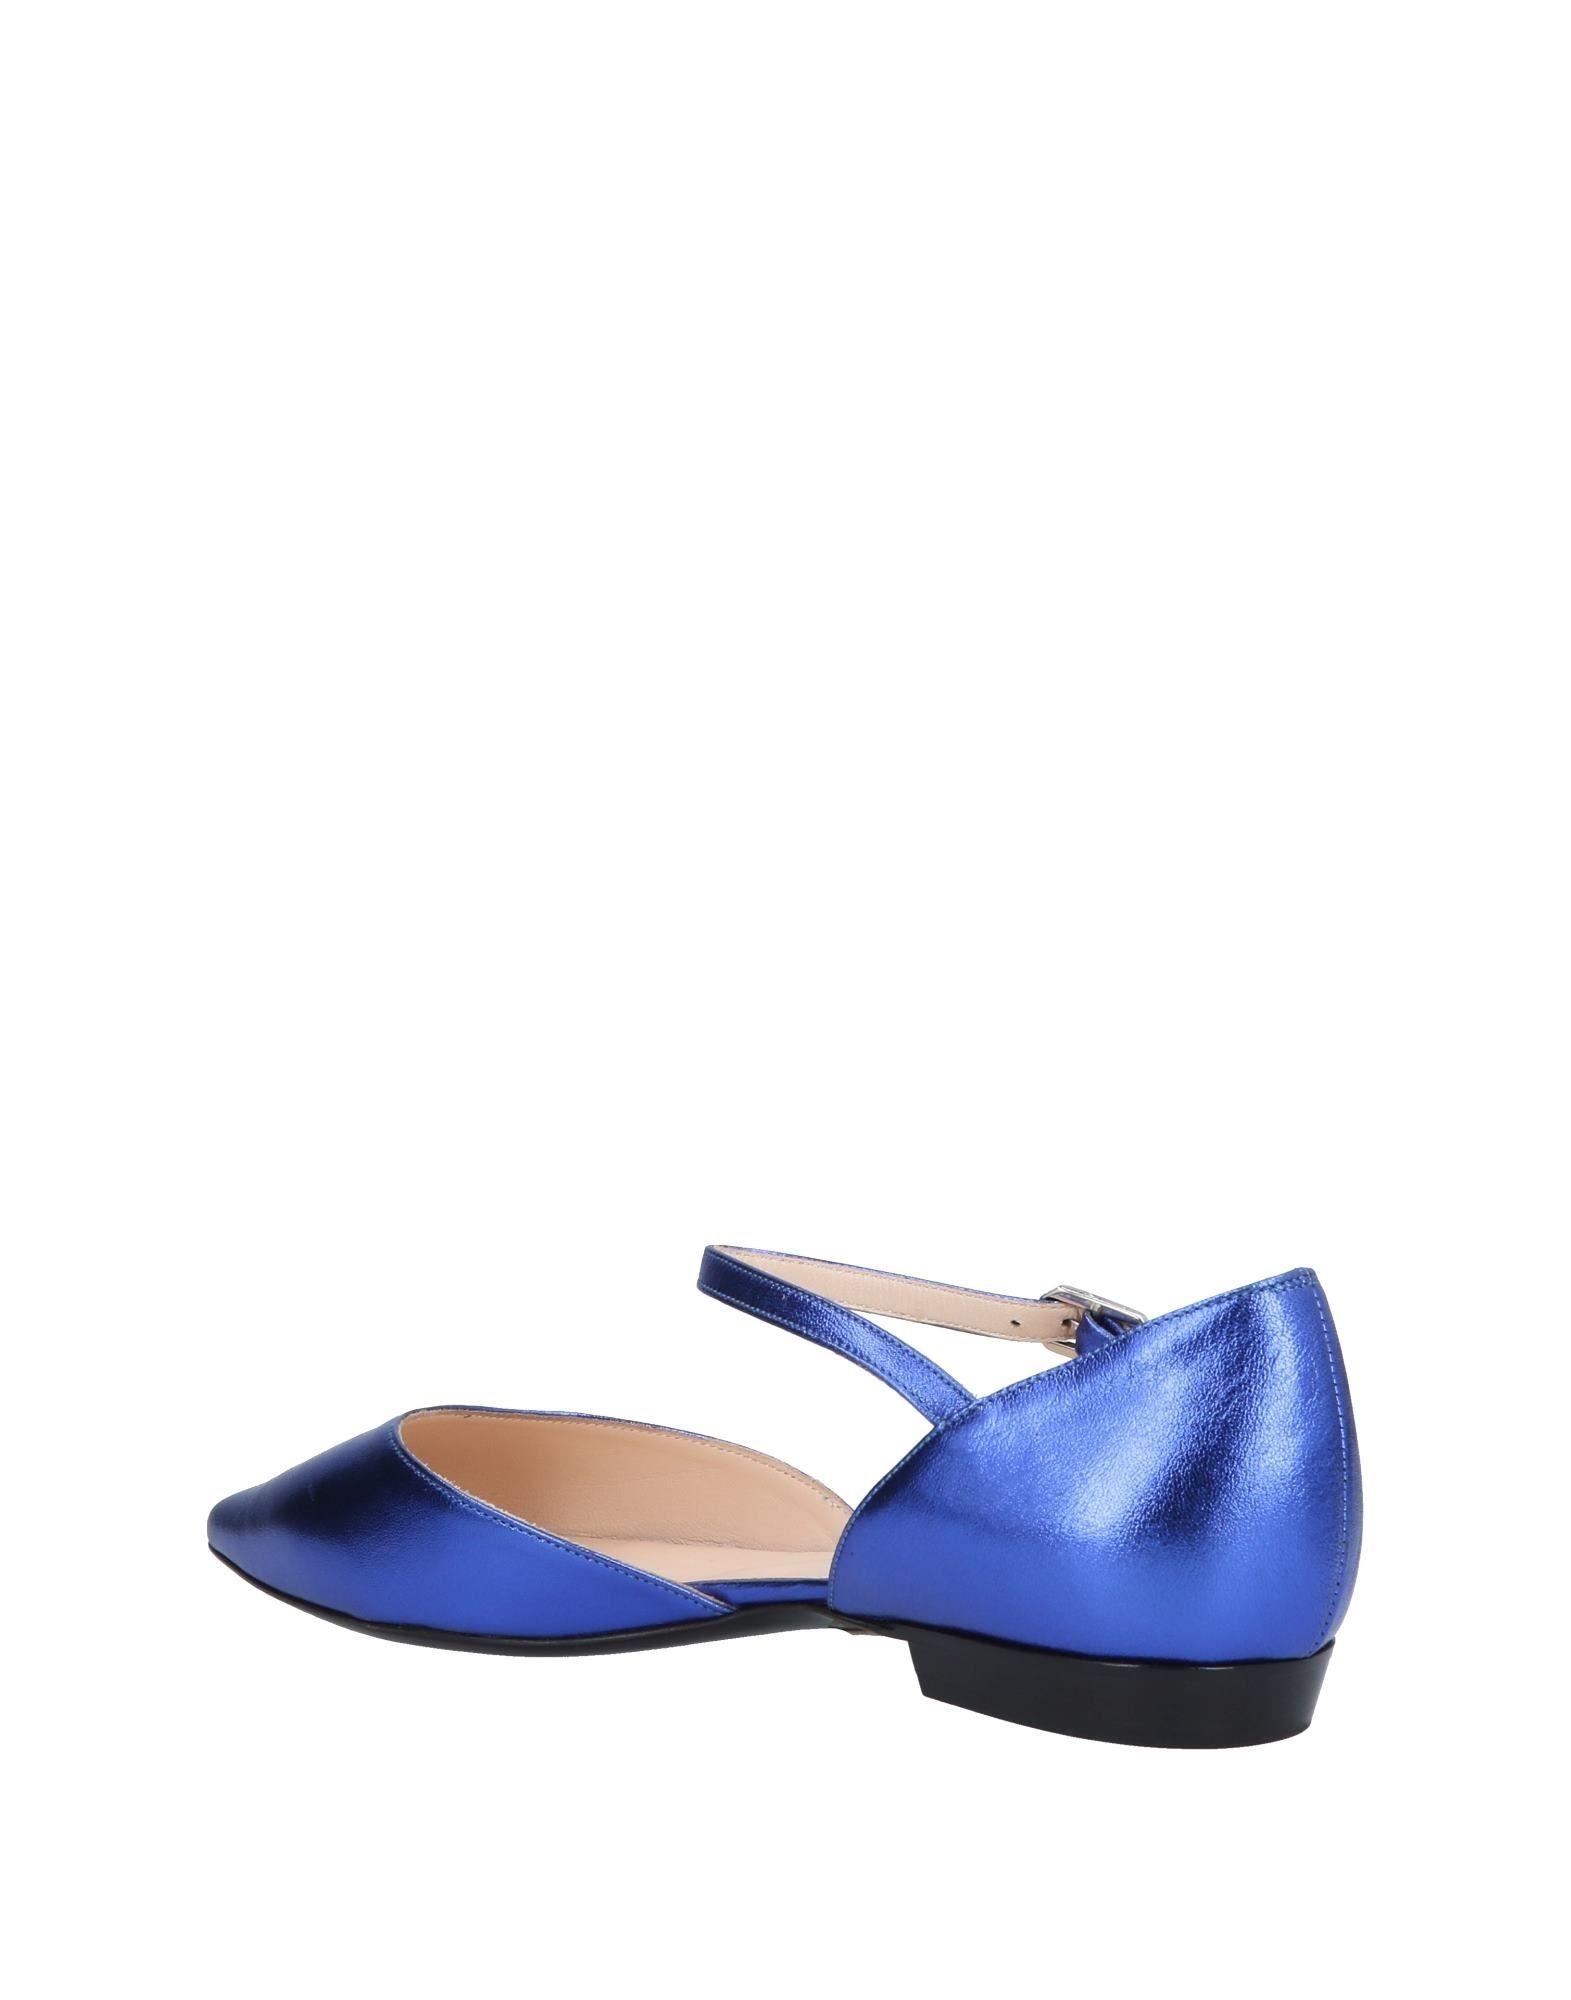 d97c1f8f40f13 ... A.Testoni Ballerinas Damen beliebte 11453466ED Gute Qualität beliebte  Damen Schuhe bc6c25 ...